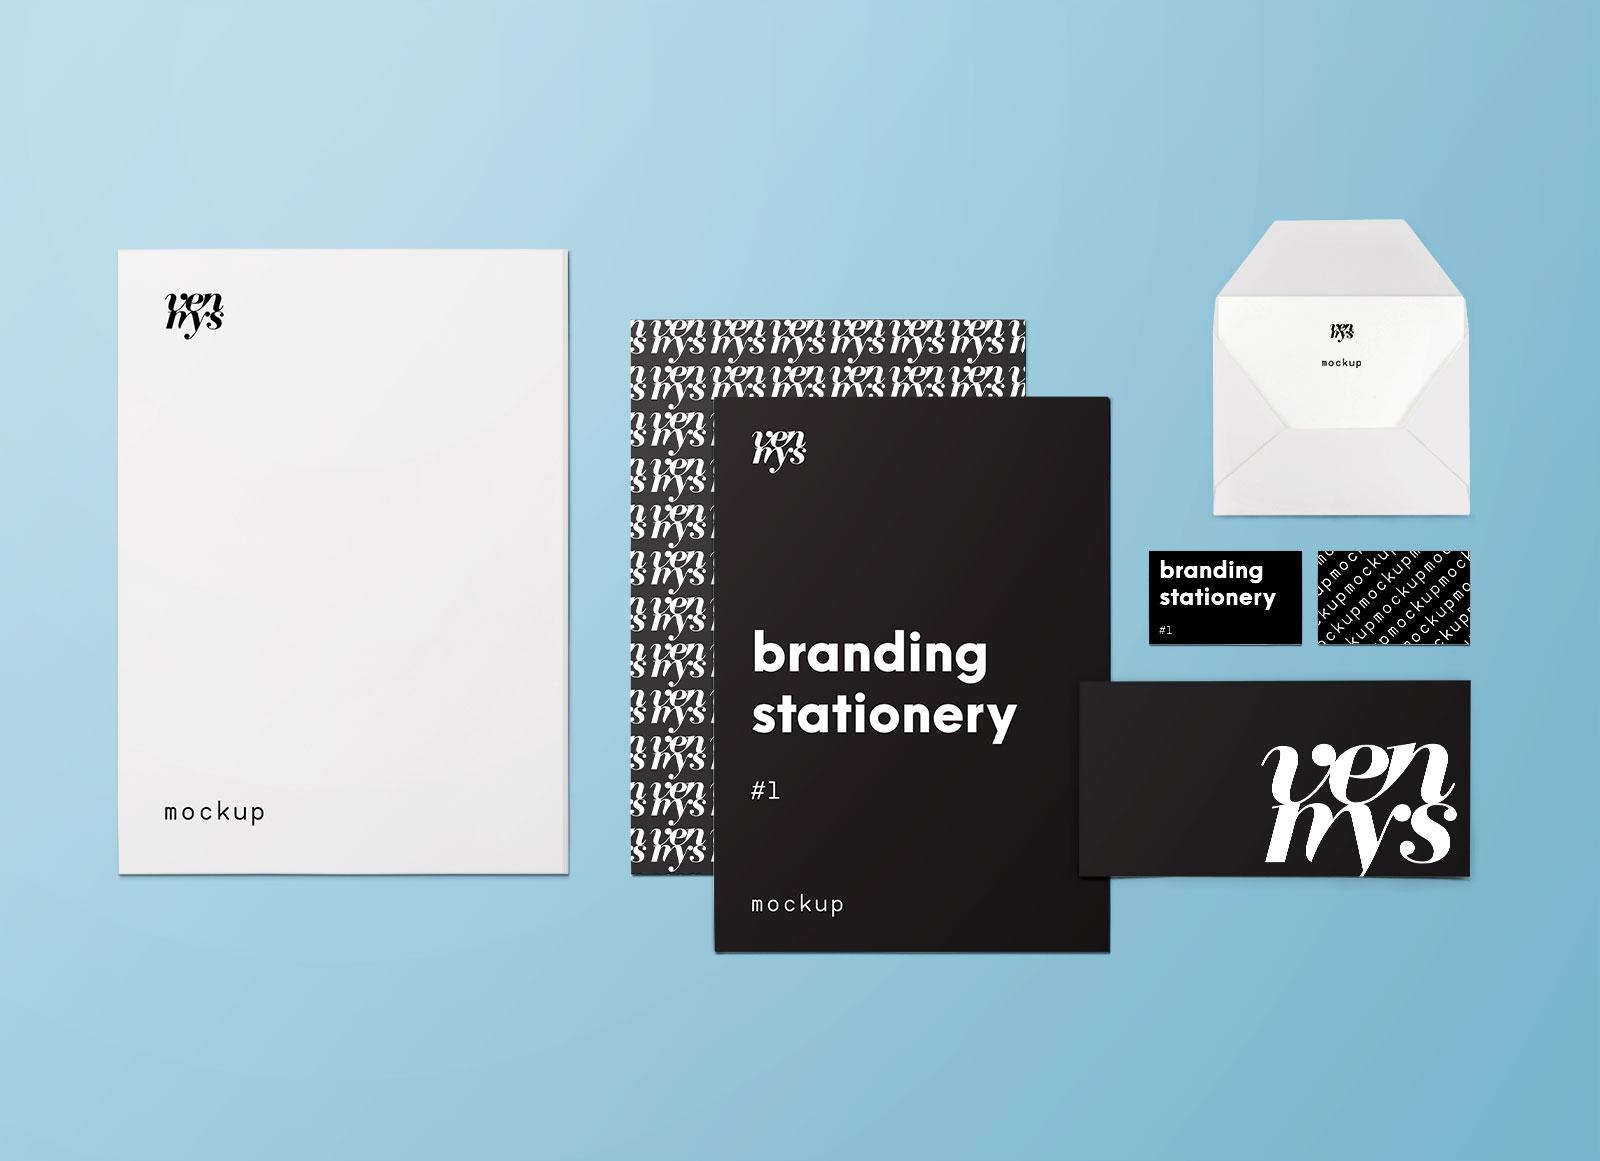 Free-Branding-Stationery-Mockup-PSD